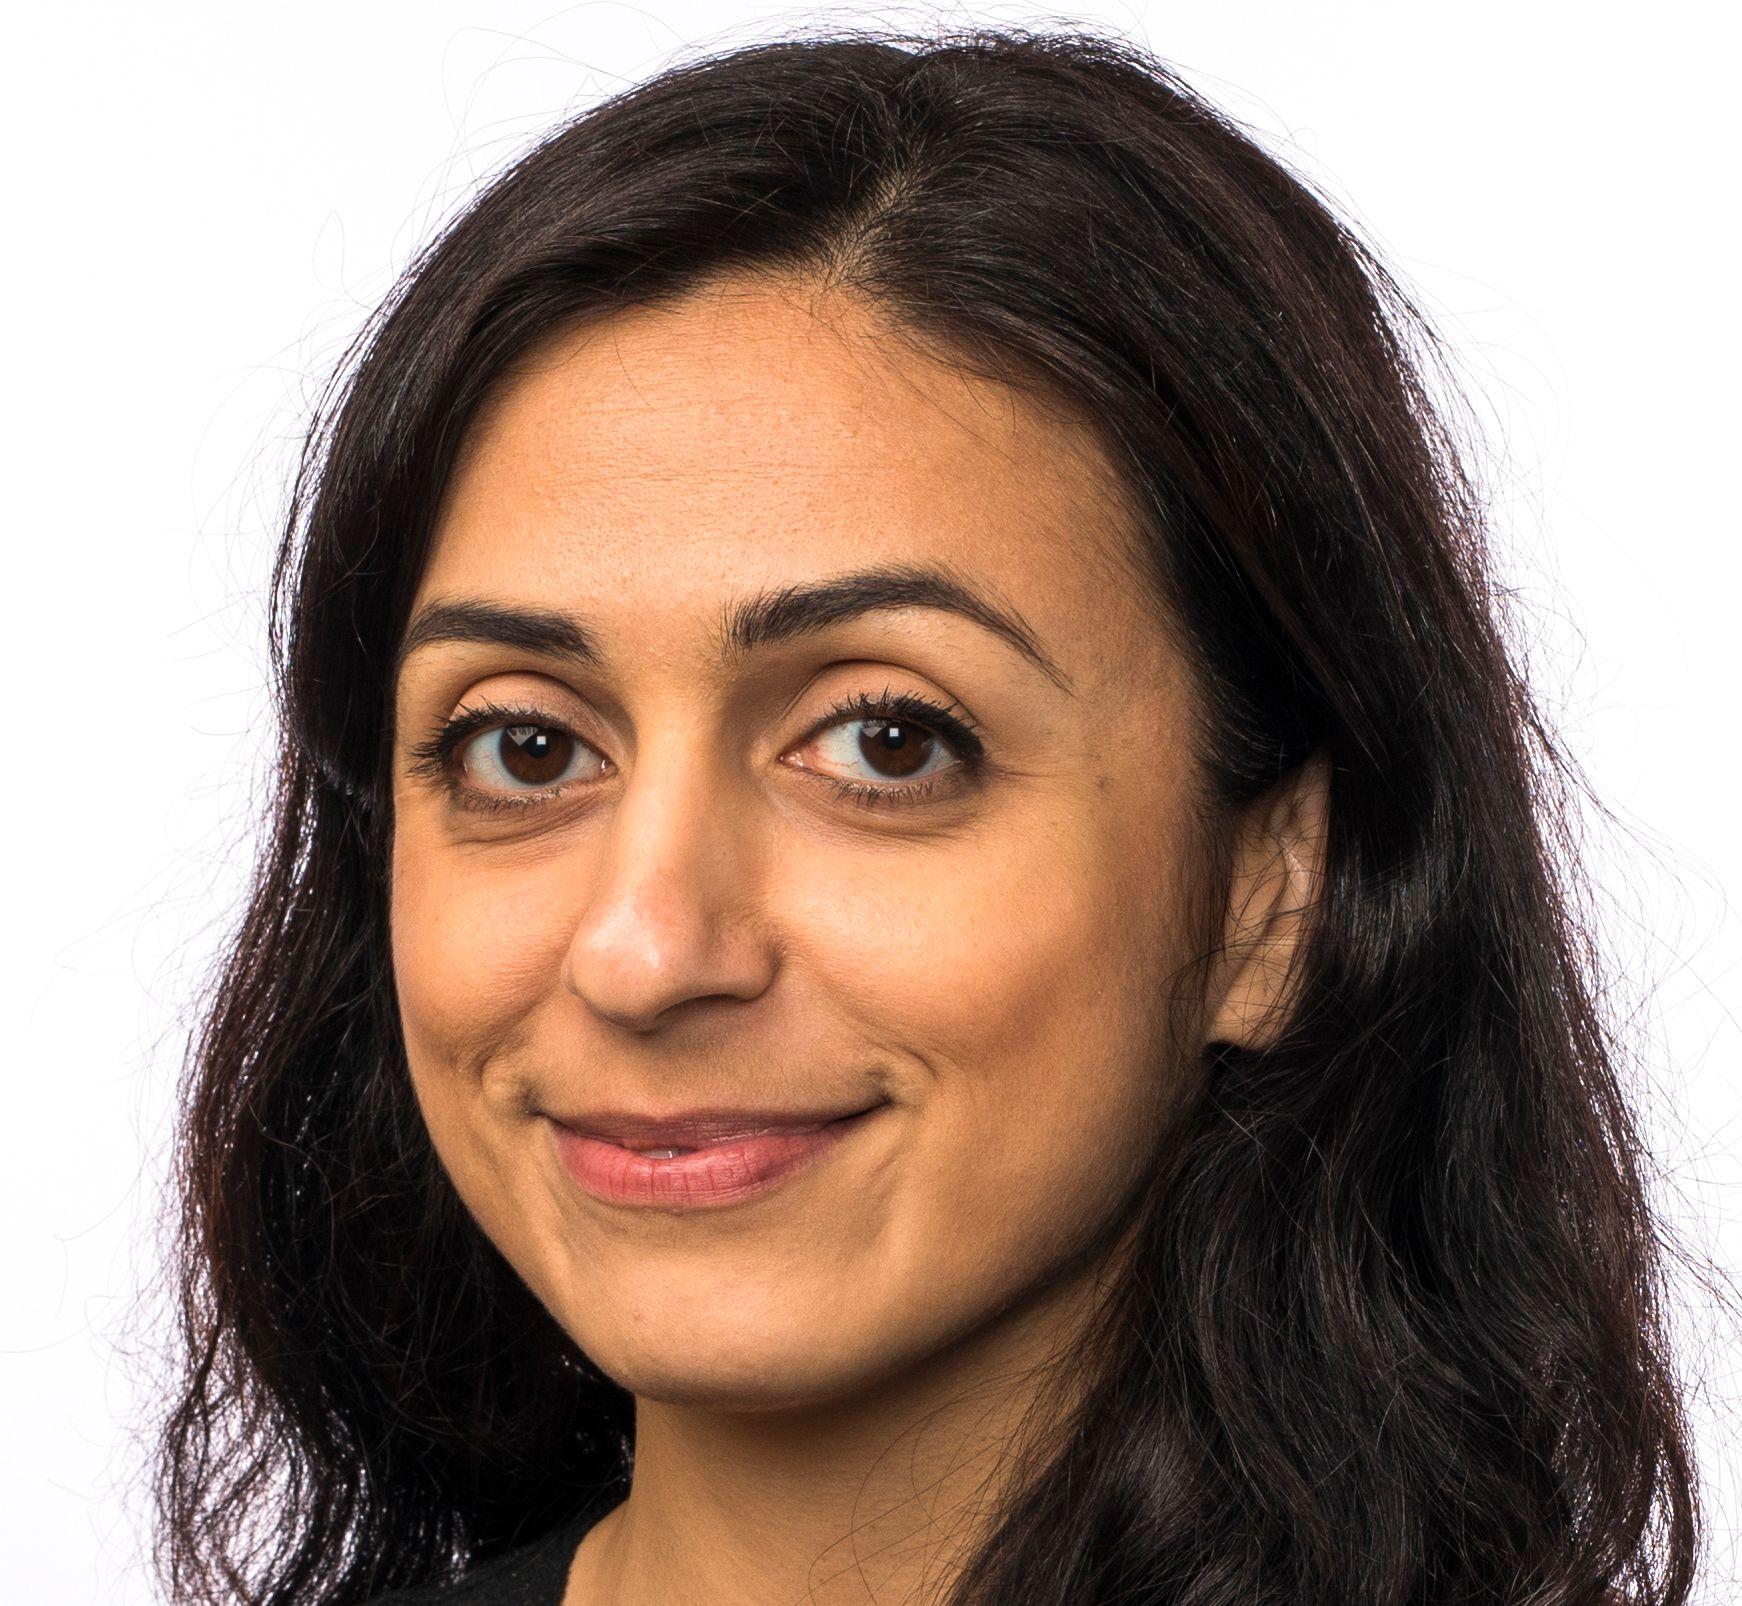 Hadia Tajik